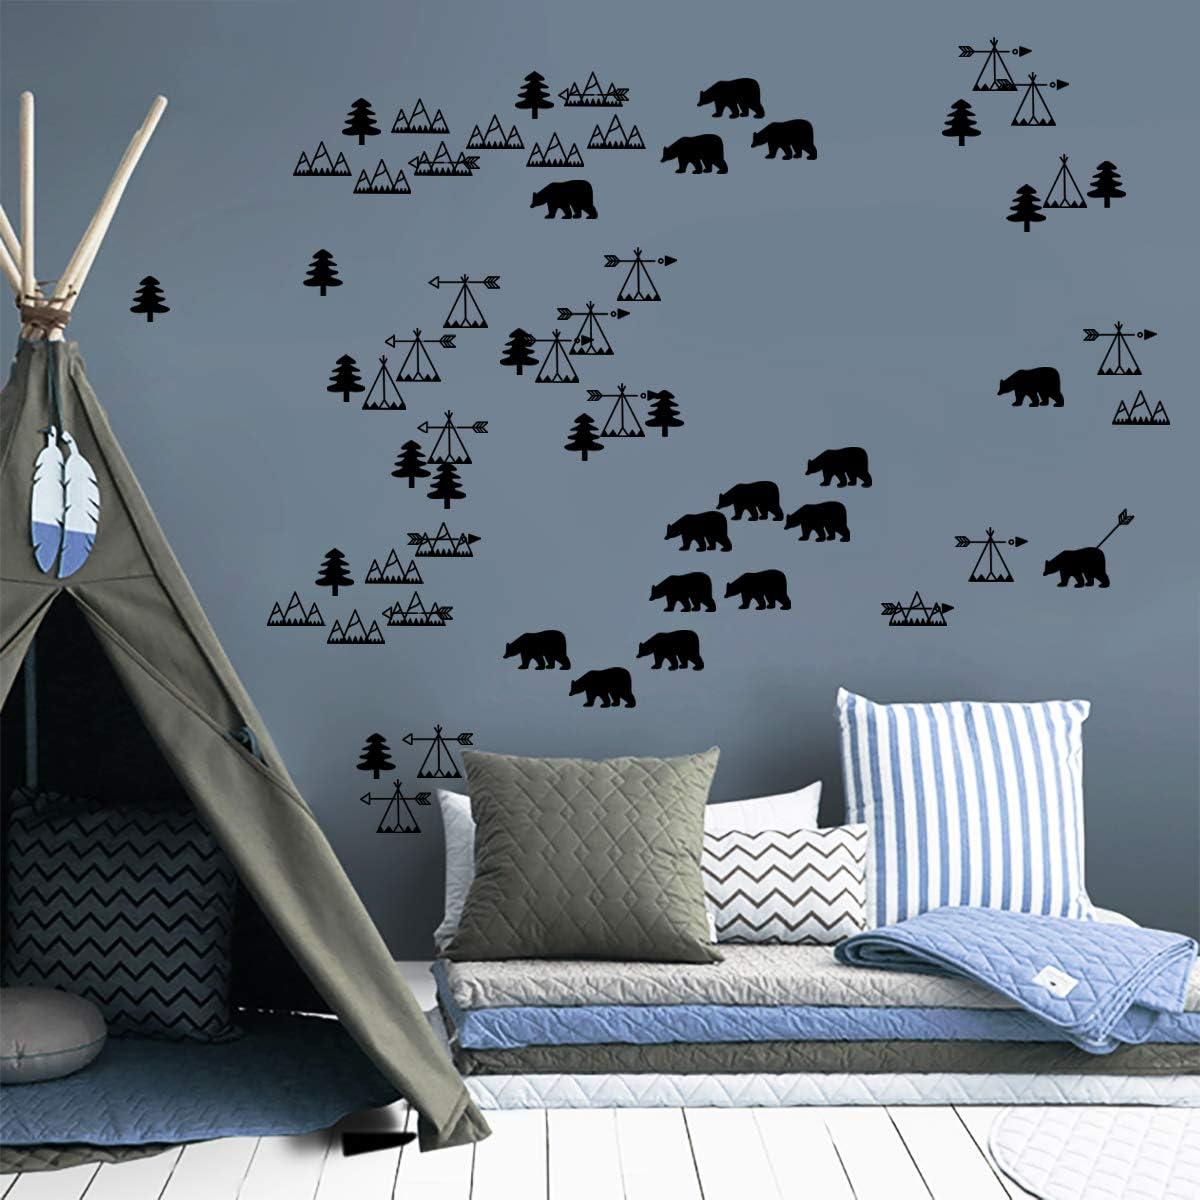 ufengke Nordic Woodland Animals Wall Stickers Bears Tree Wall Decals Nursery Wall Art Decor for Kids Bedroom Living Room